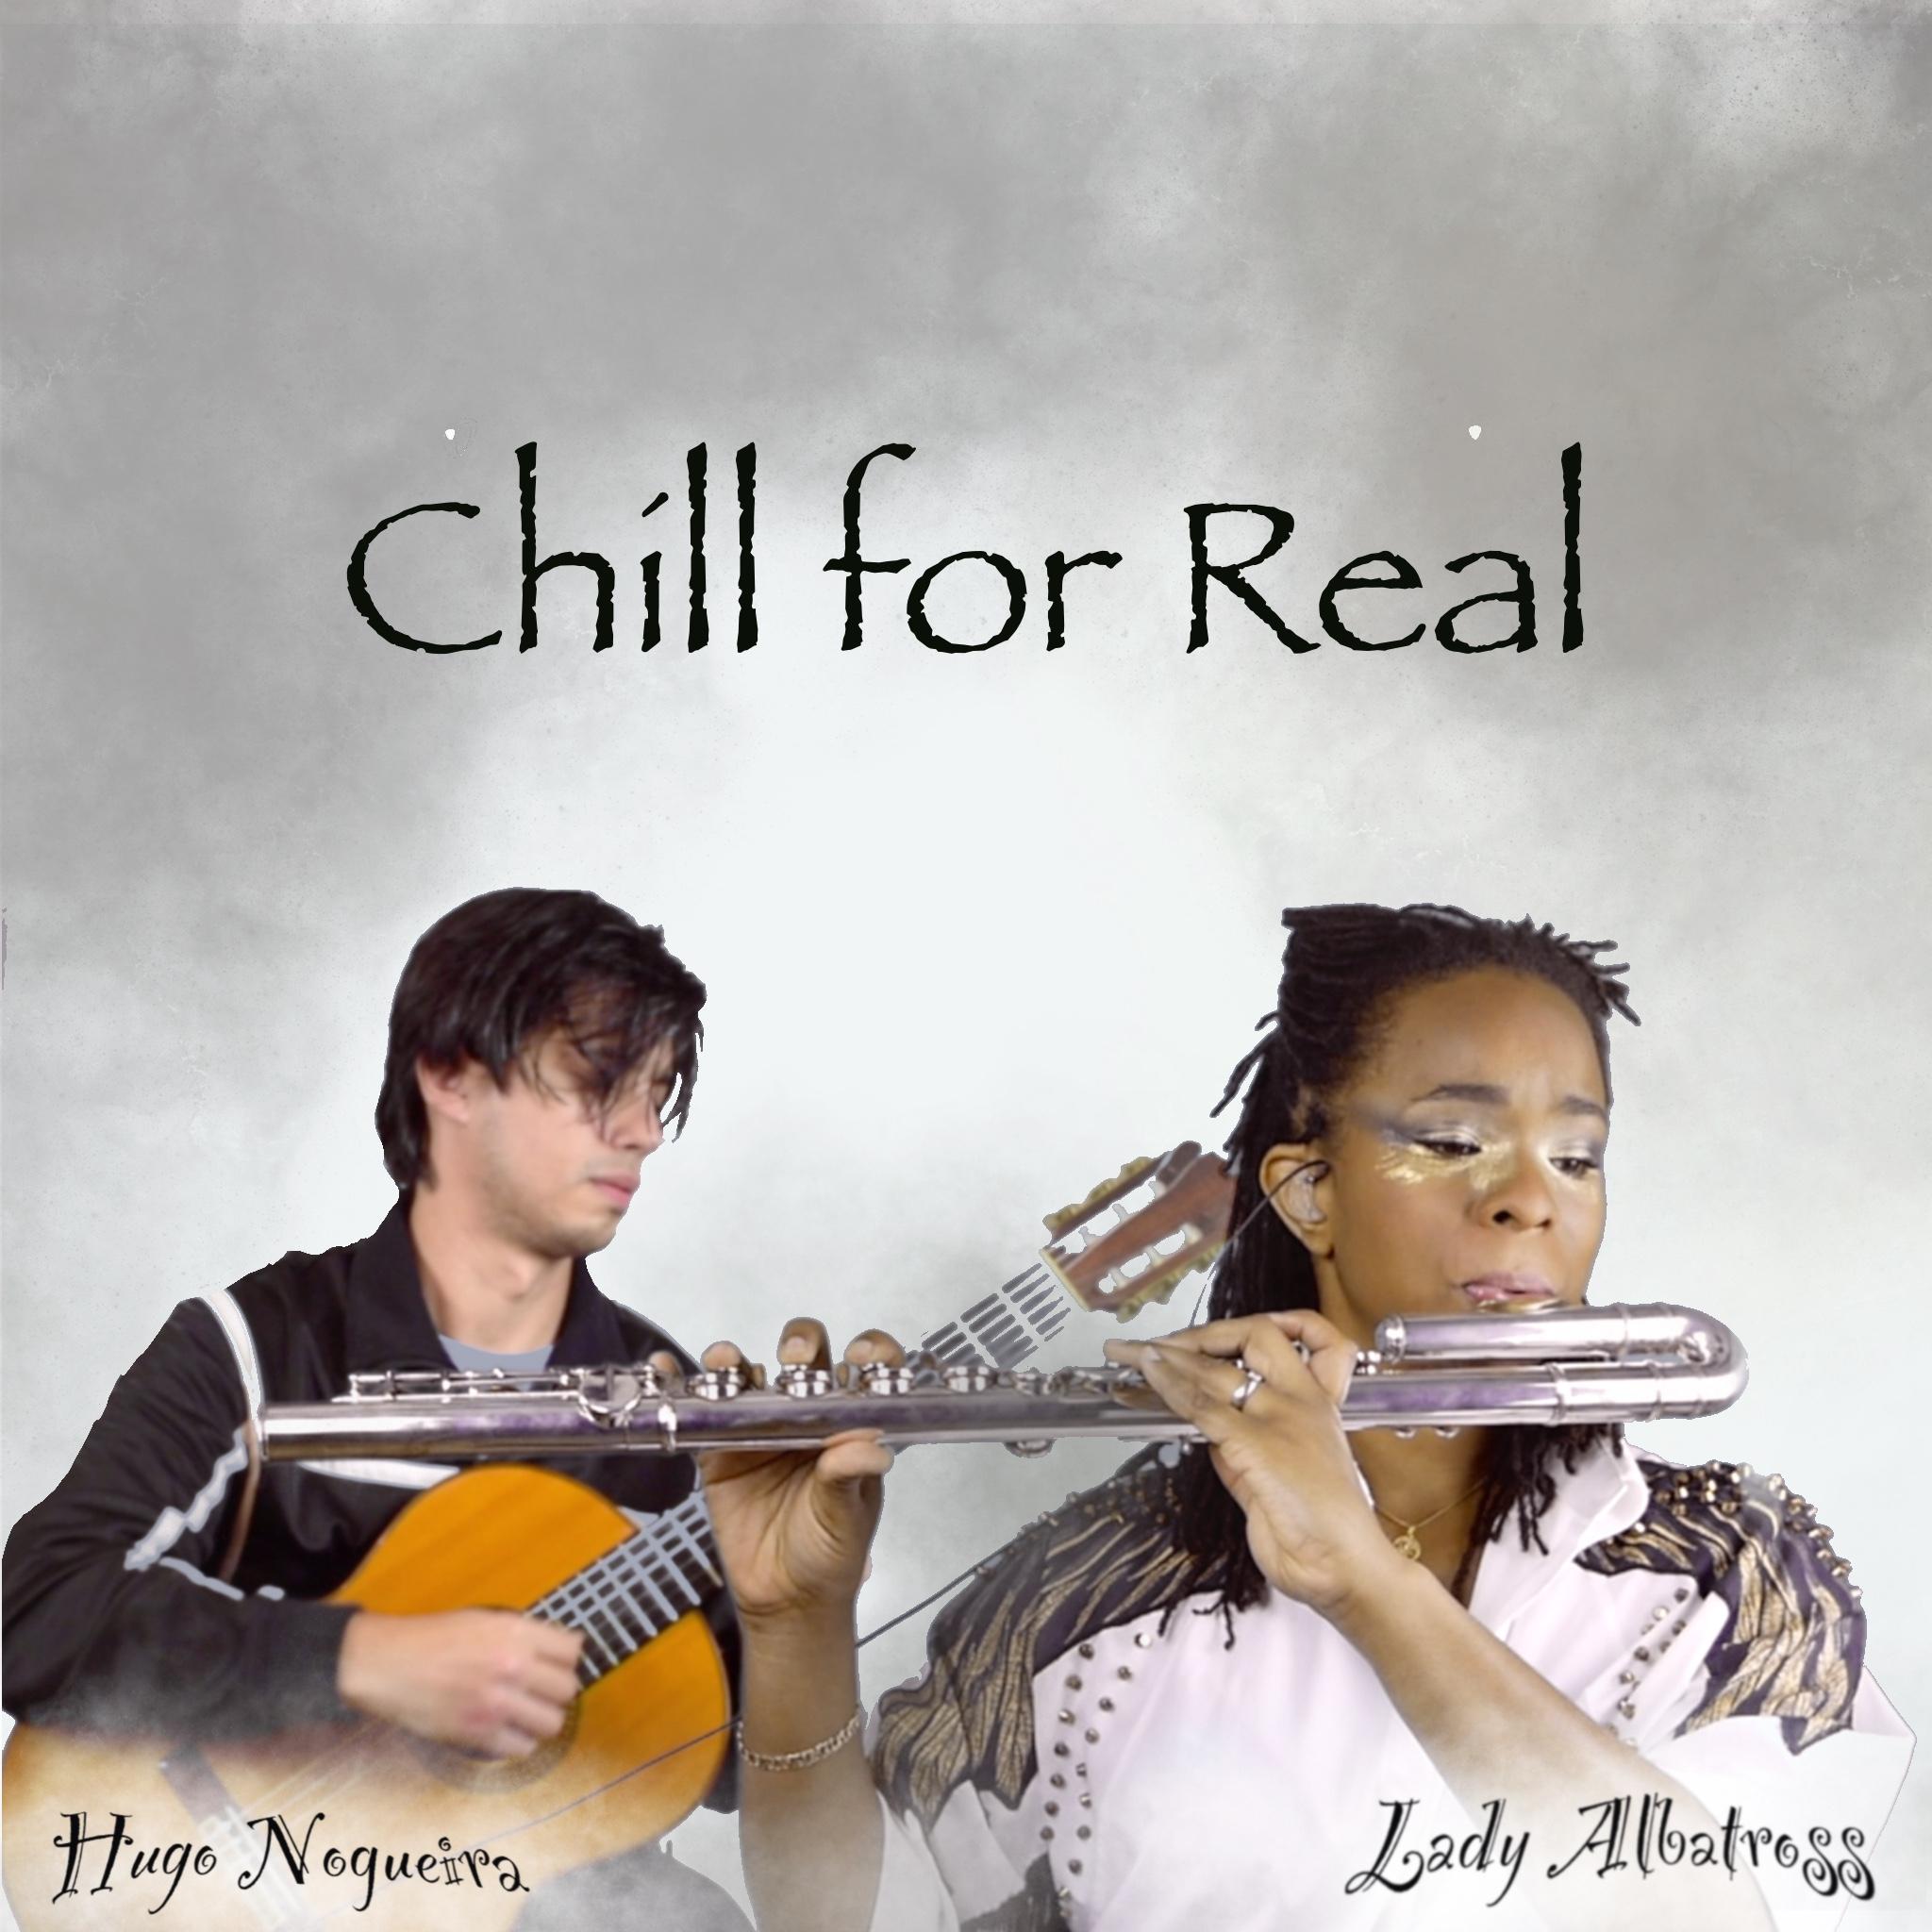 Original jazz composition by Hugo Nogueira